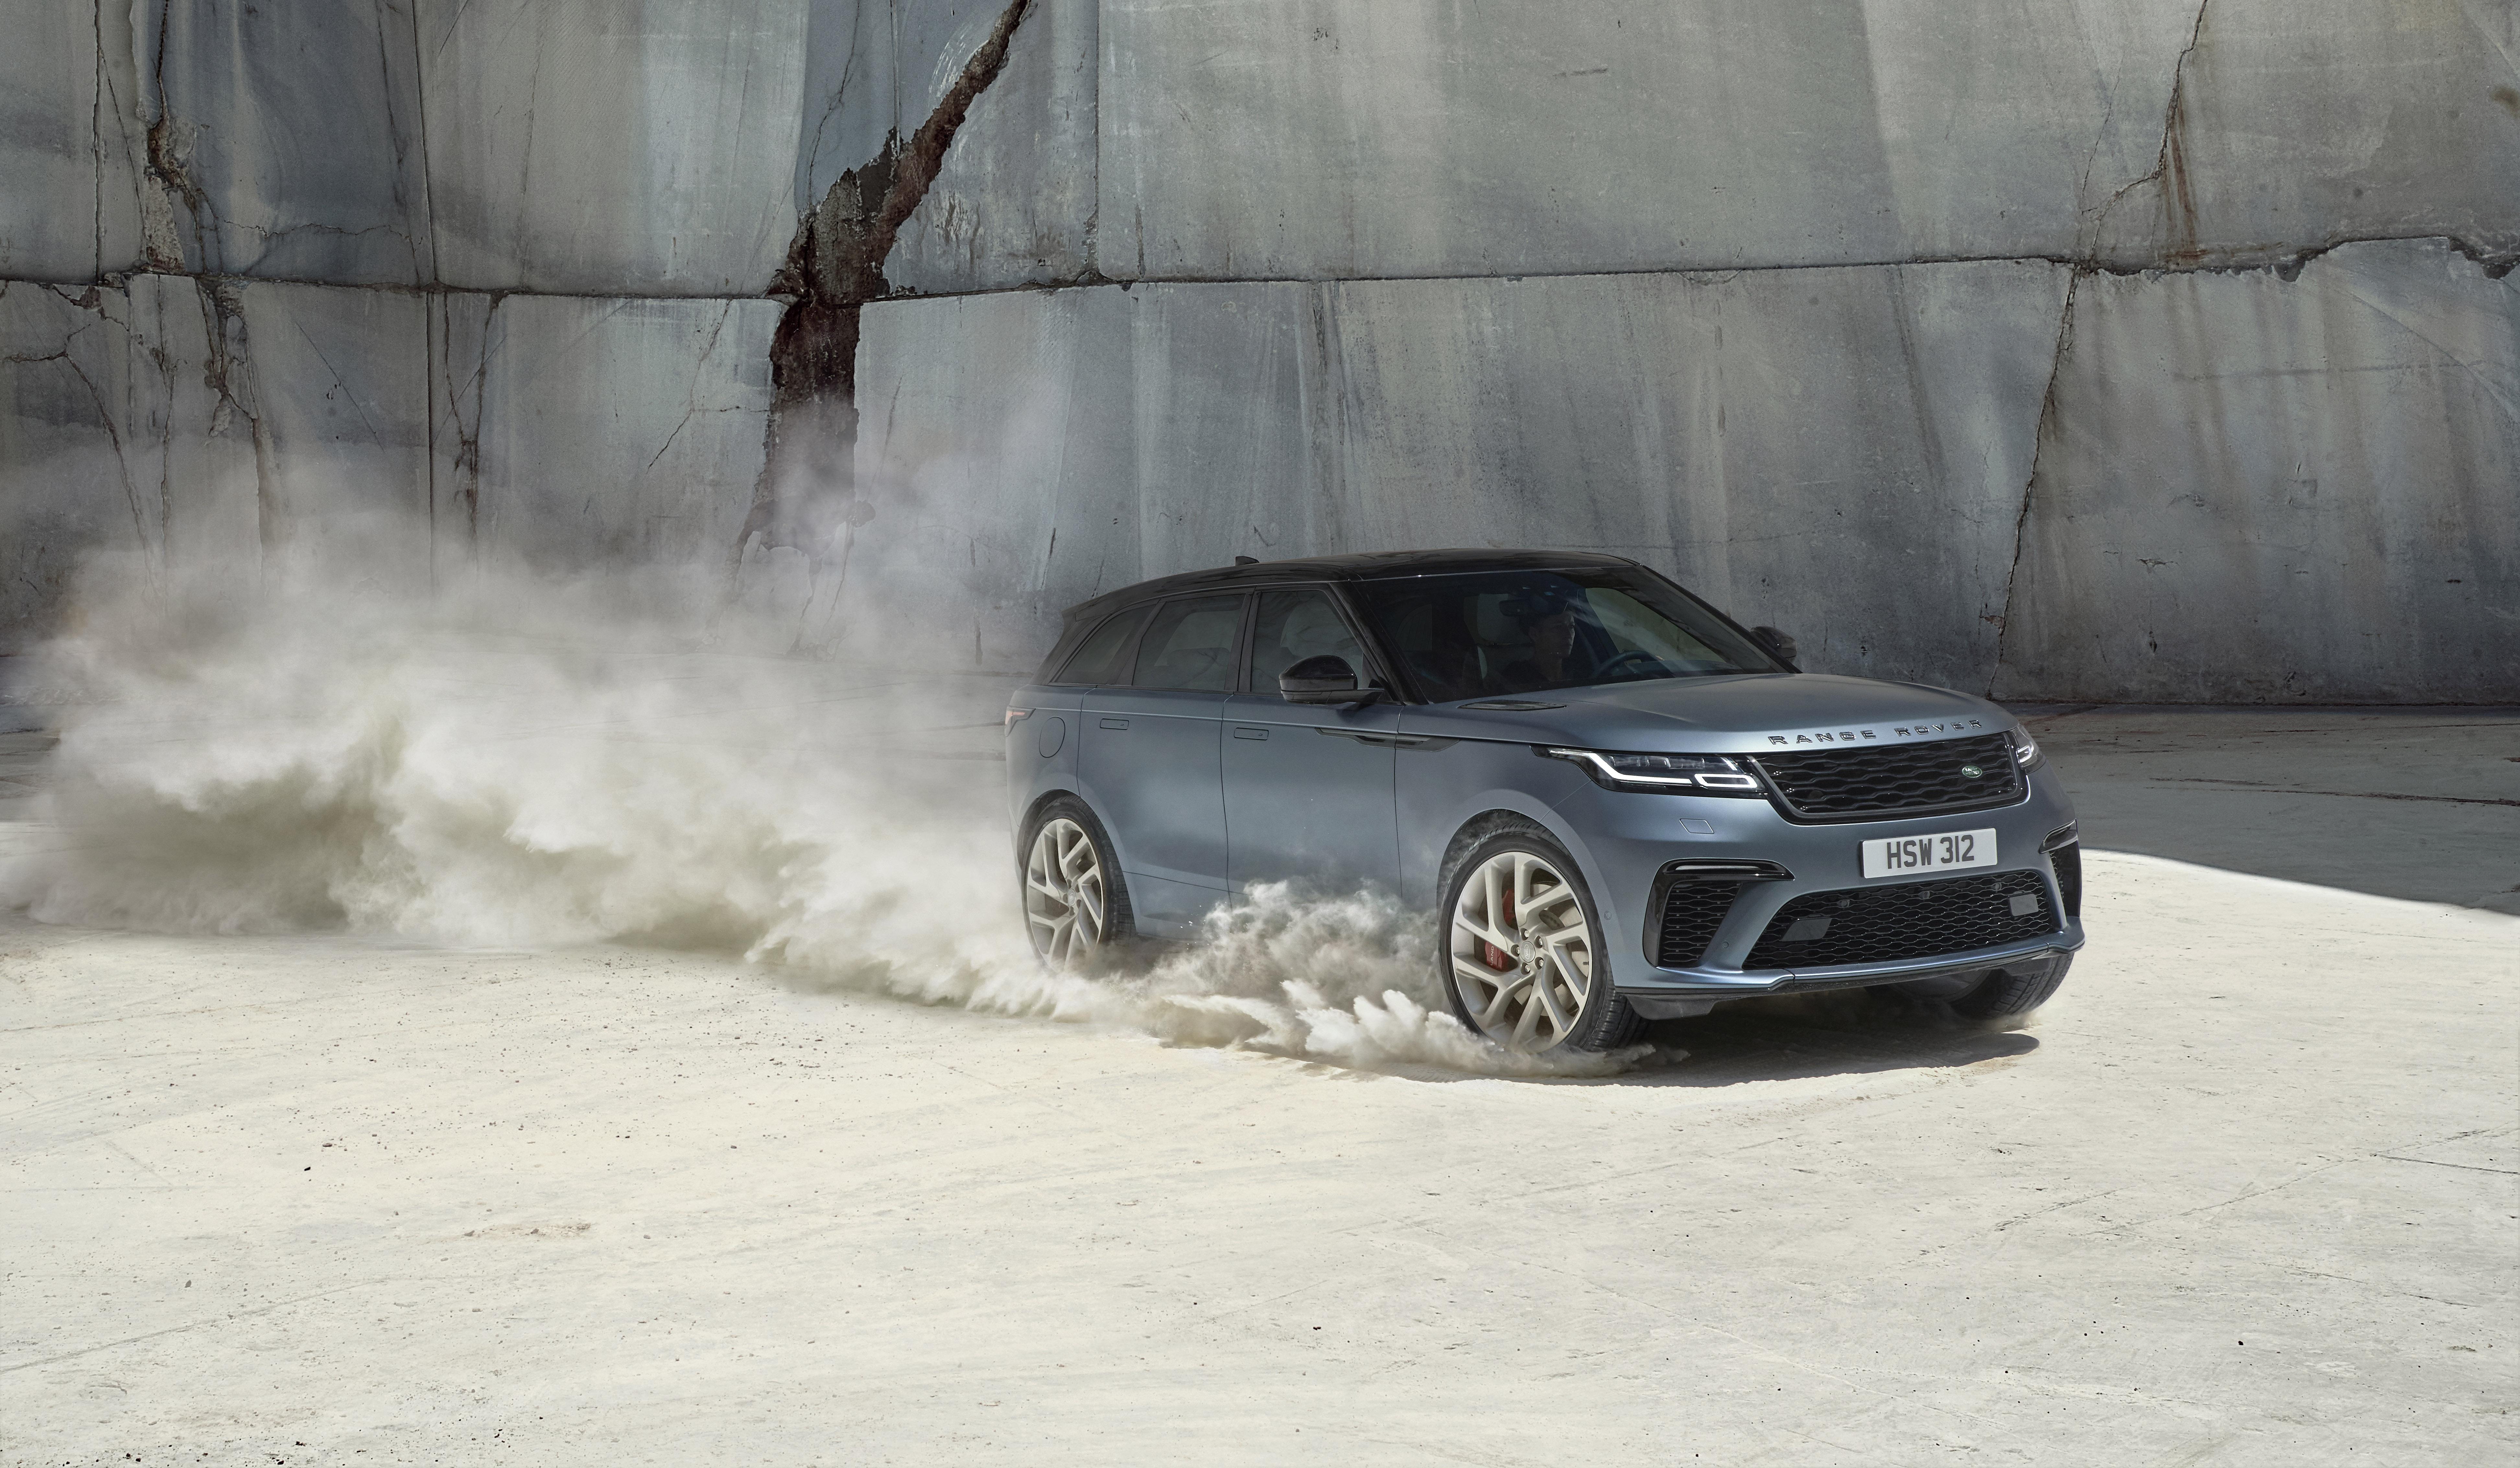 2019 Land Rover Range Rover Velar Svautobiography Hd Cars 4k